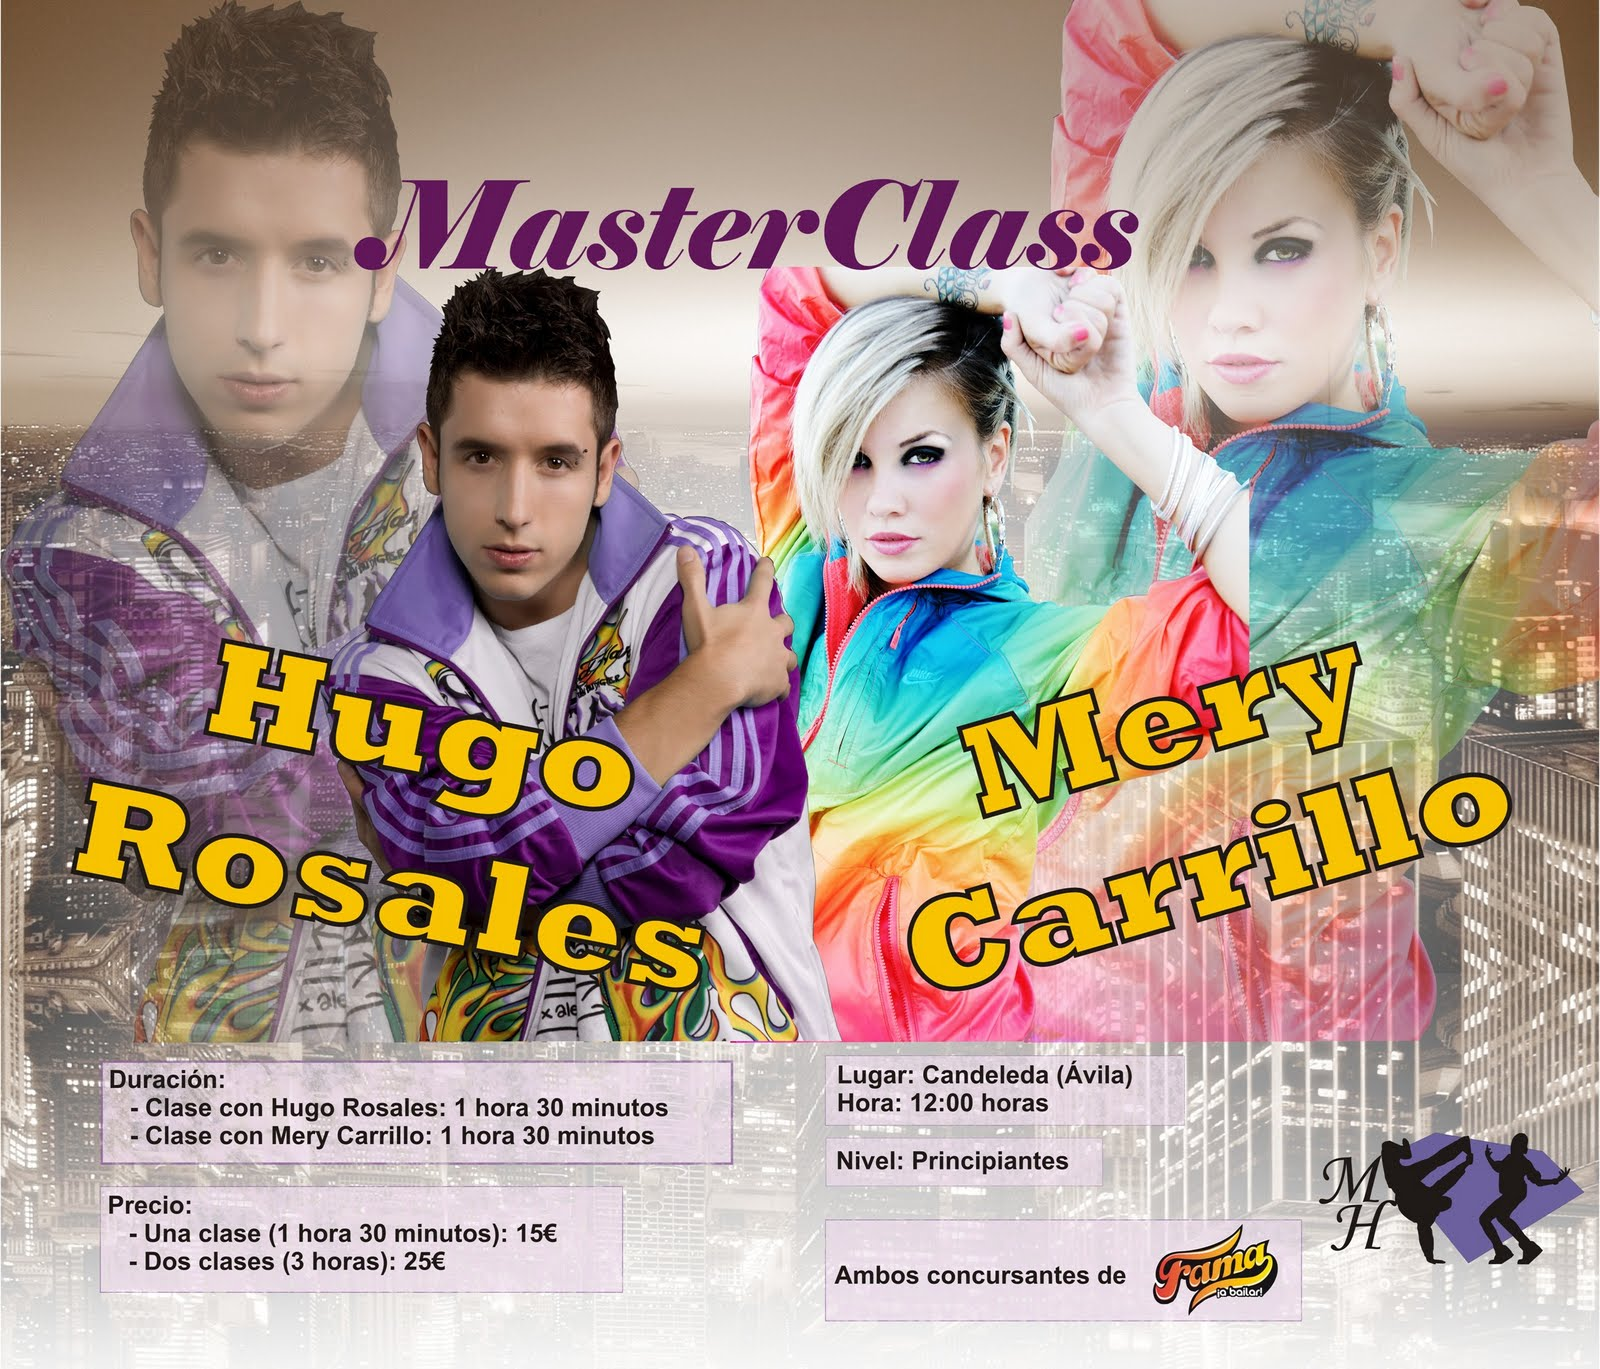 http://3.bp.blogspot.com/_hKeygLP19qE/TNcvQGmFGfI/AAAAAAAAB-g/Xh-jDef7T2E/s1600/Cartel+Master+Candeleda3.JPG